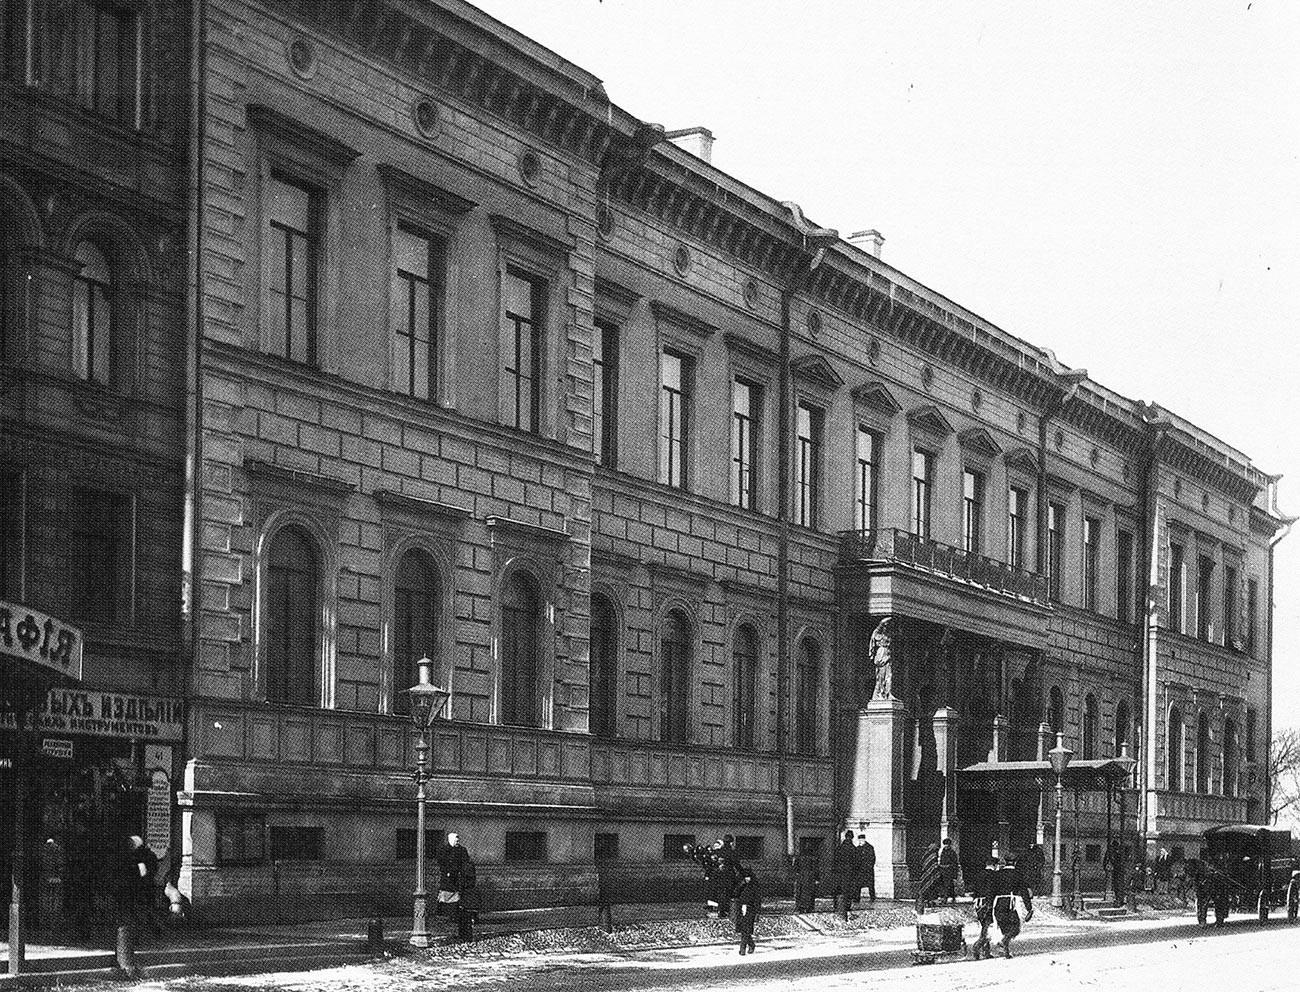 Poslopje Ministrstva za finance Ruskega imperija